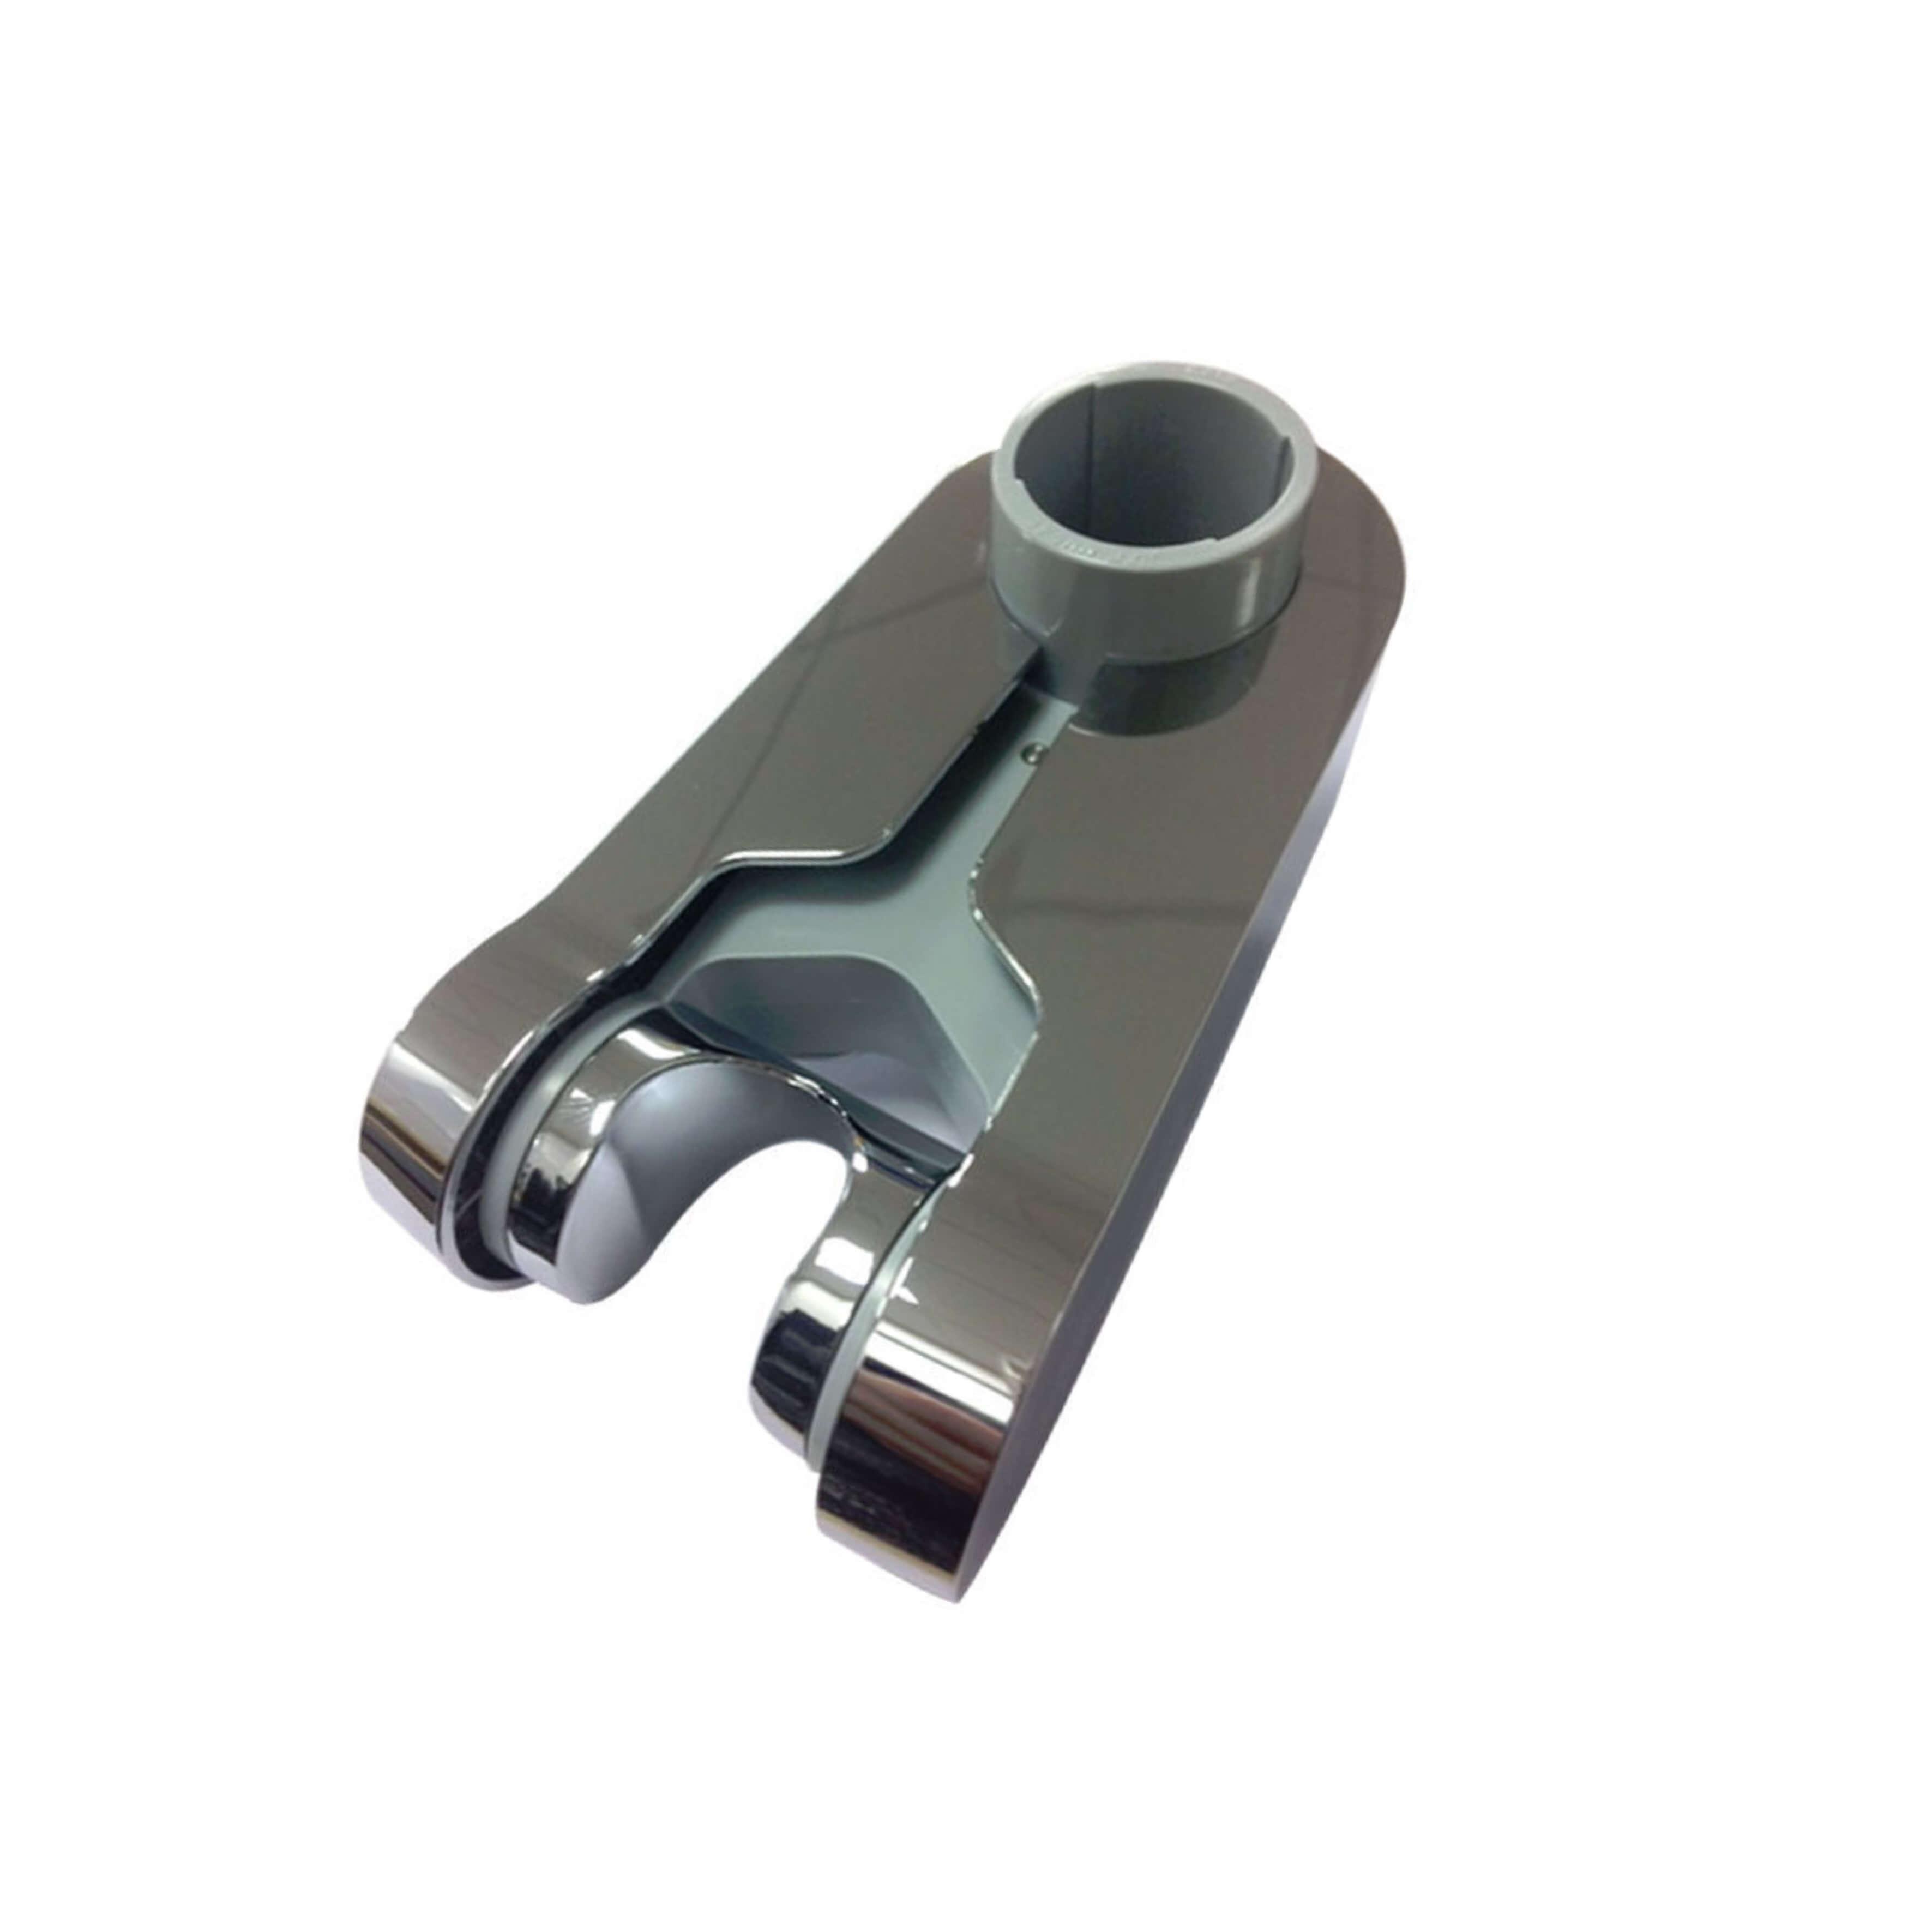 Aqualisa 25mm Slider Rail Handset Holder 910314